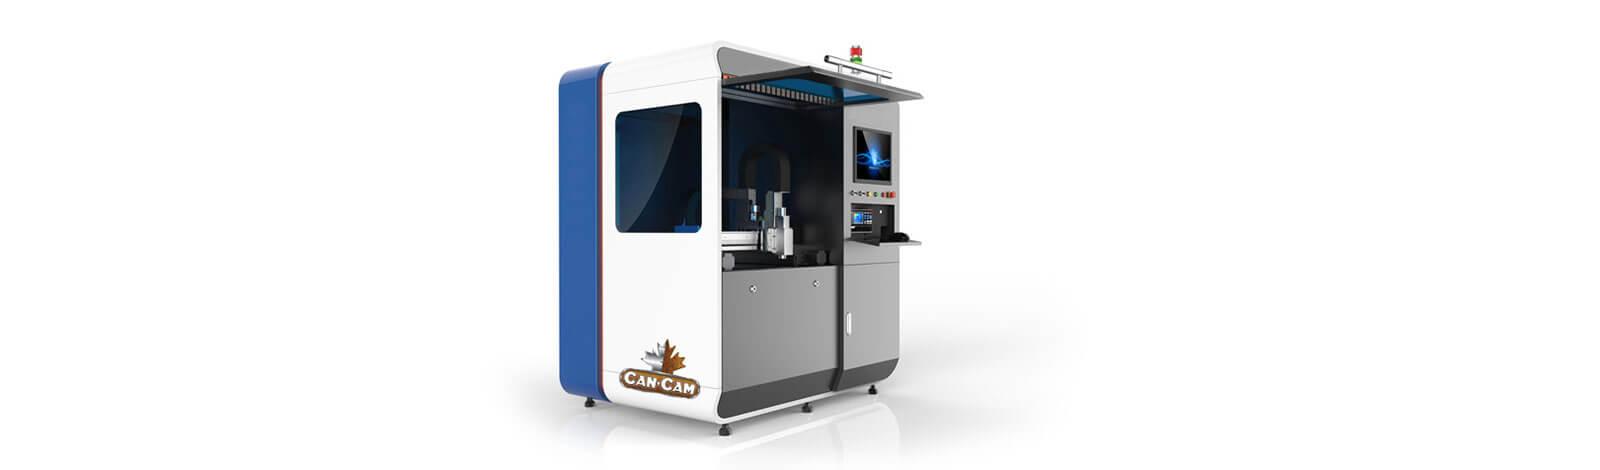 BEAM CNC Laser Cutter Engraver